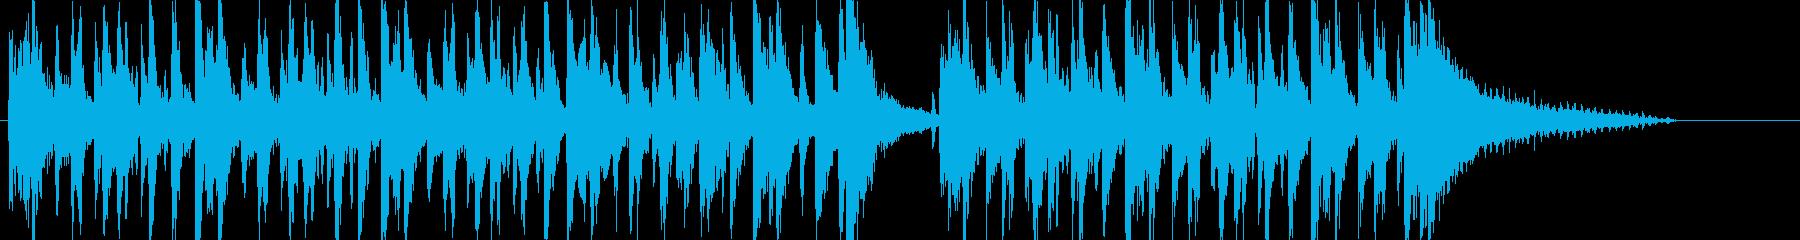 【CM】ダークでお洒落なイメージの再生済みの波形